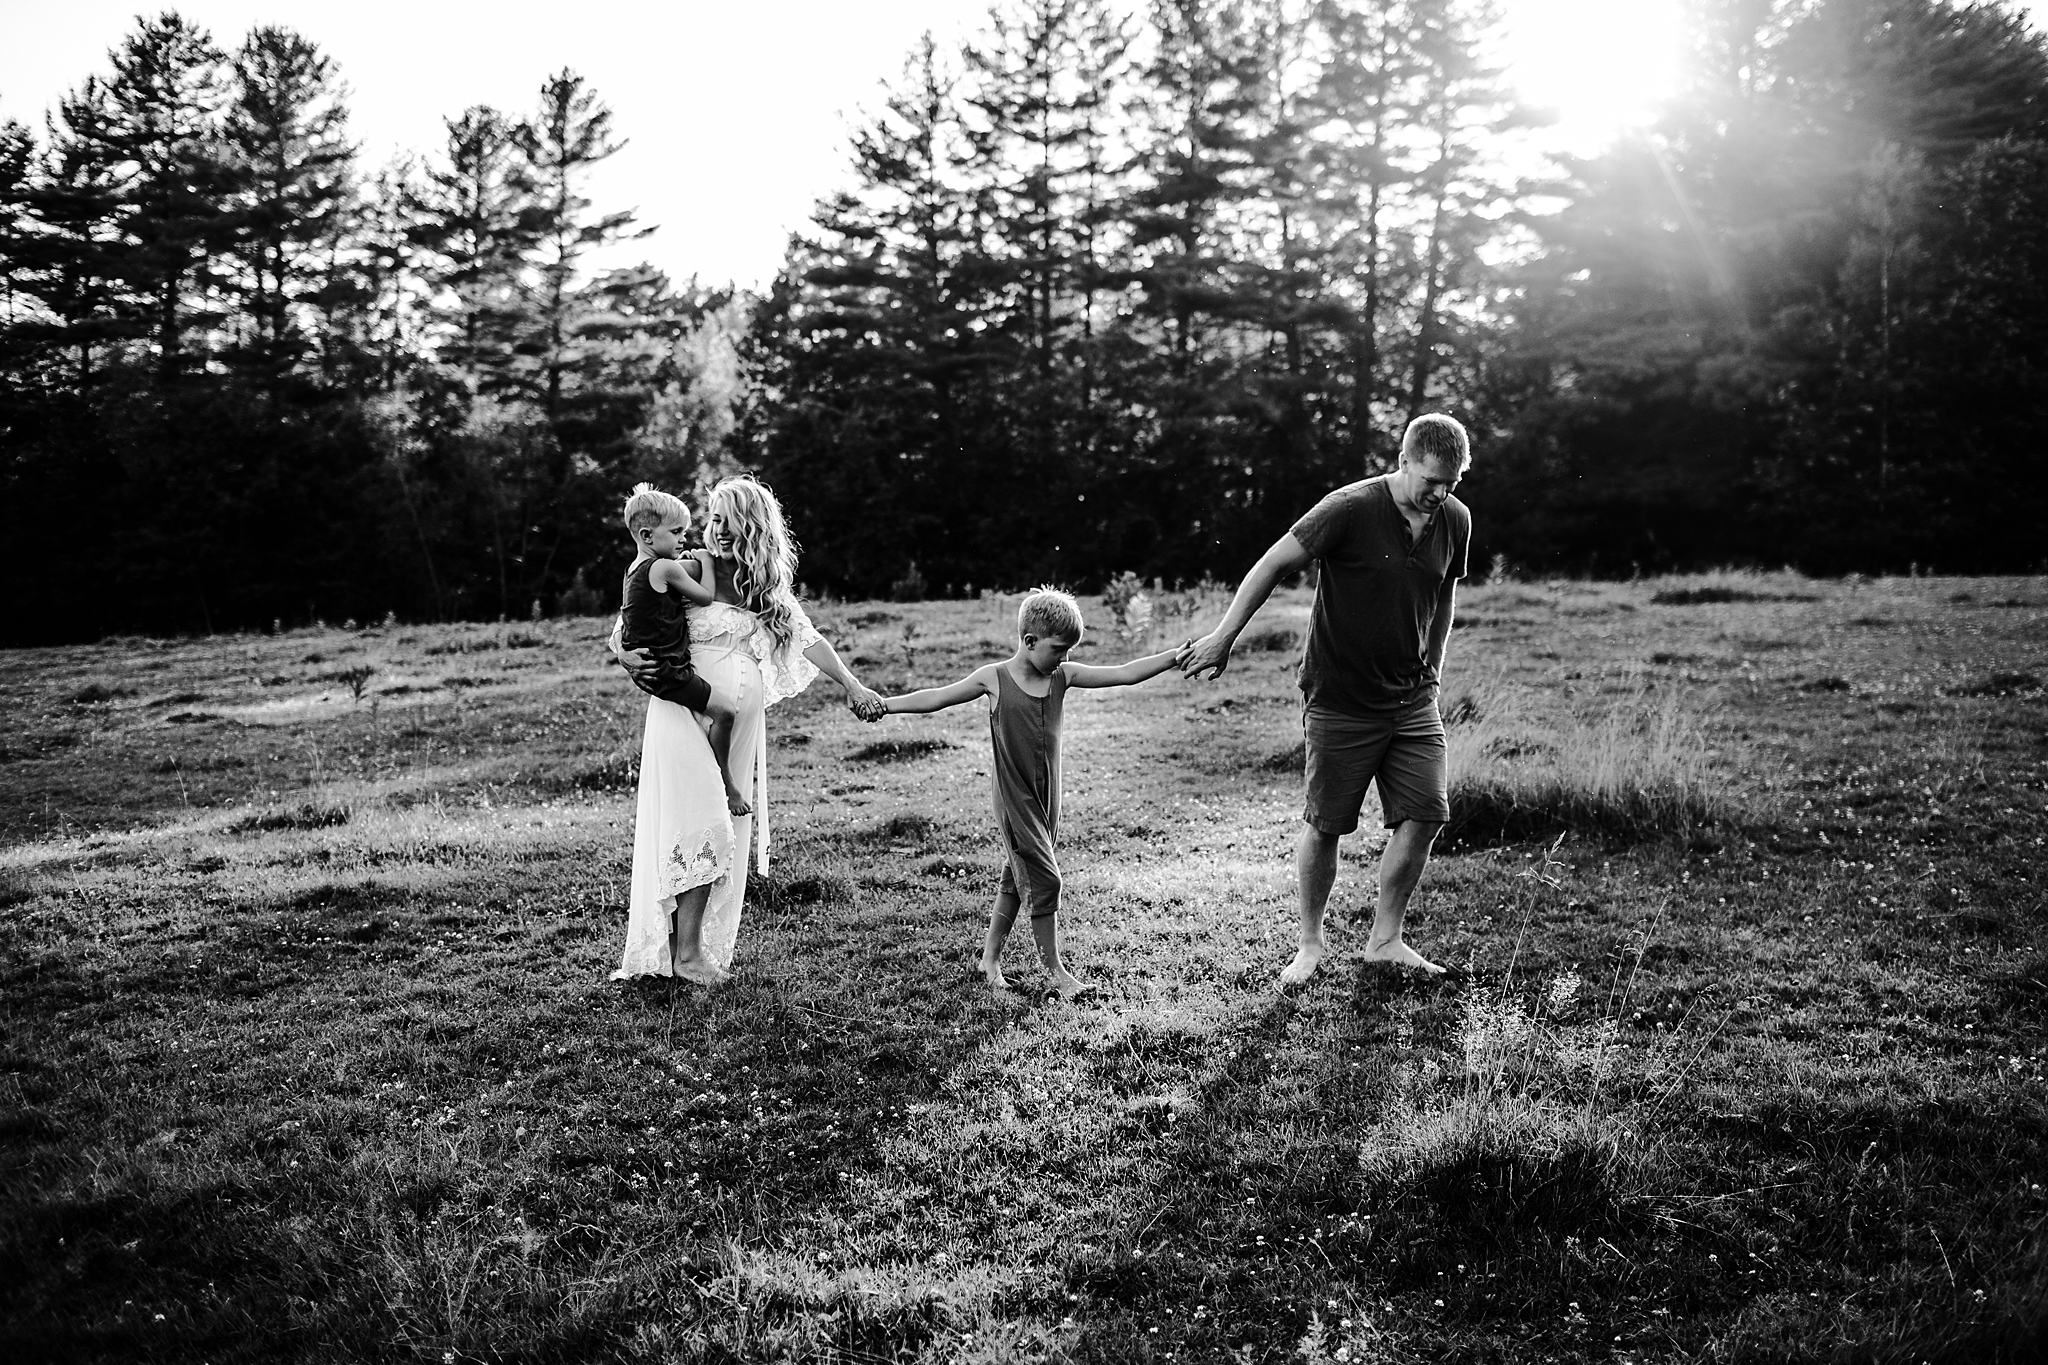 Emily-San-Antonio-Family-Photographer00021_WEB.jpg